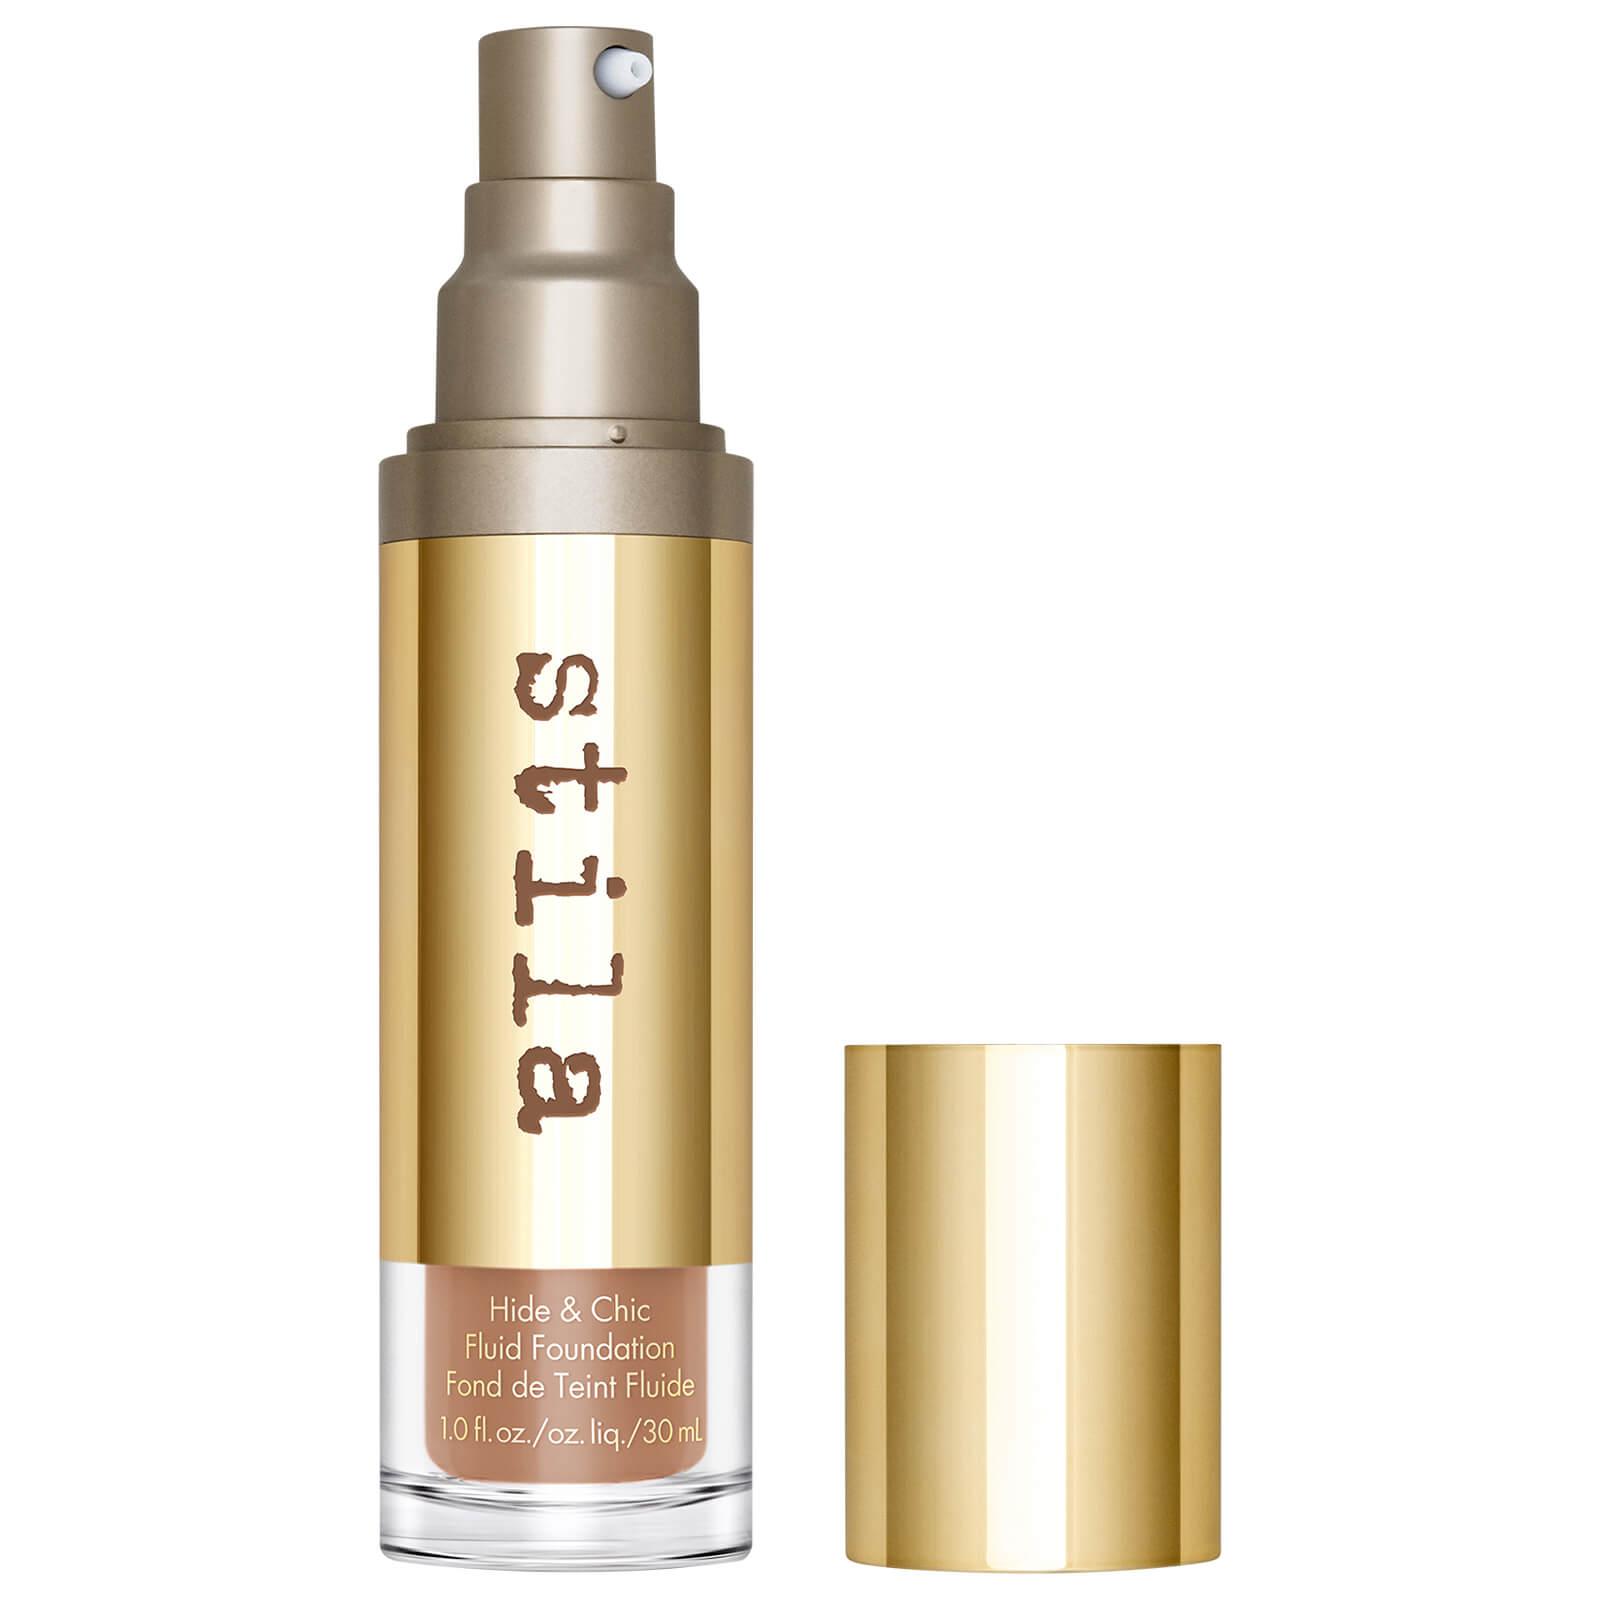 Купить Stila Hide and Chic Fluid Foundation 30ml (Various Shades) - Tan 4